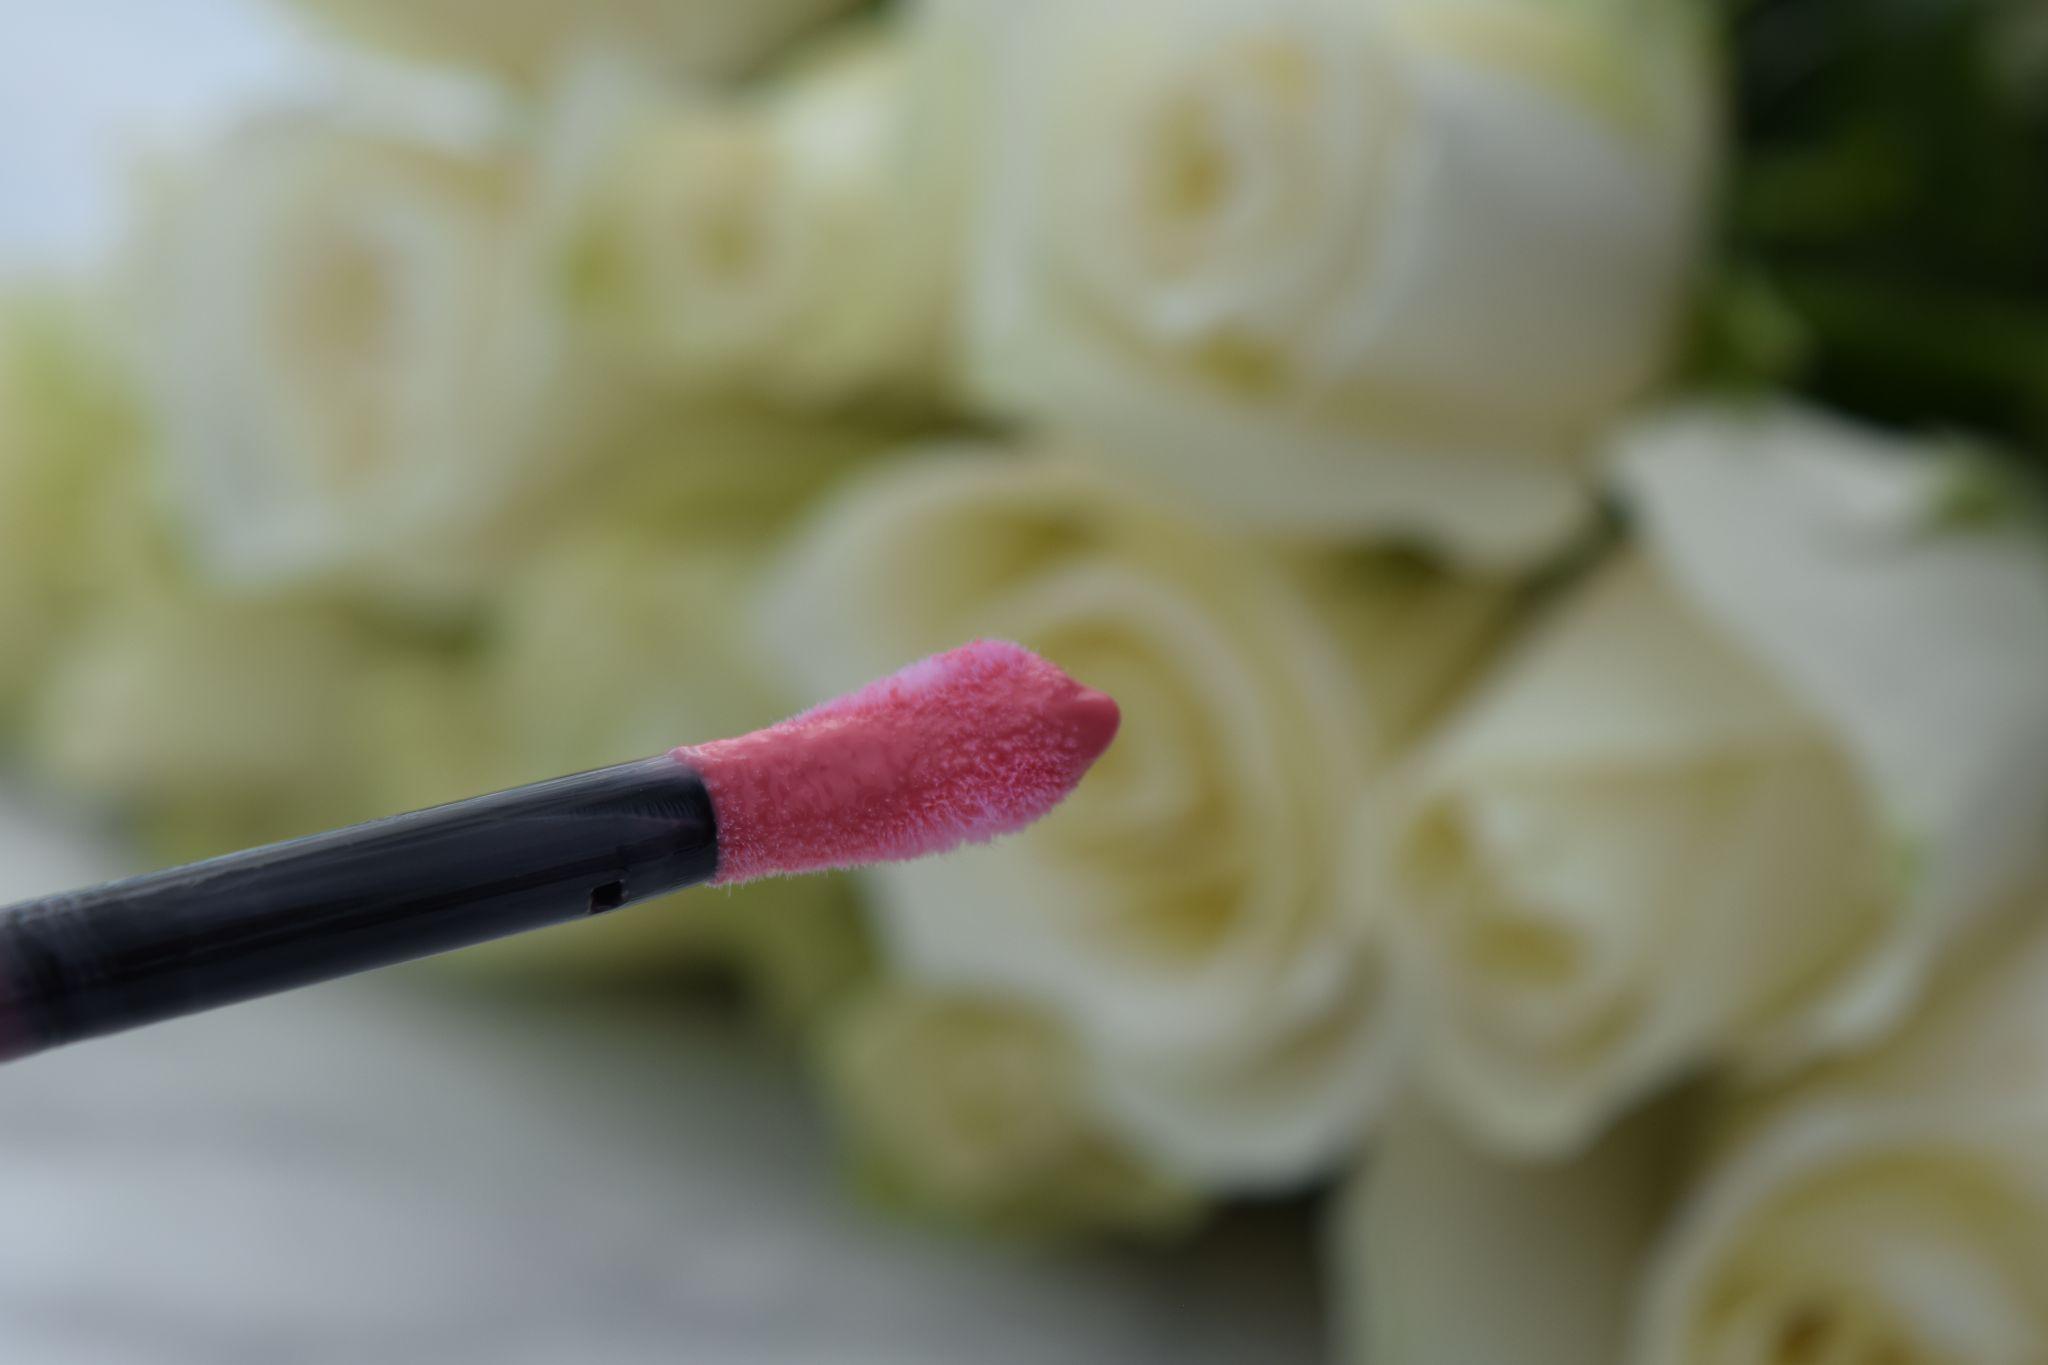 Sisley Phyto-Lip Delight Lipgloss - 02 Sweet